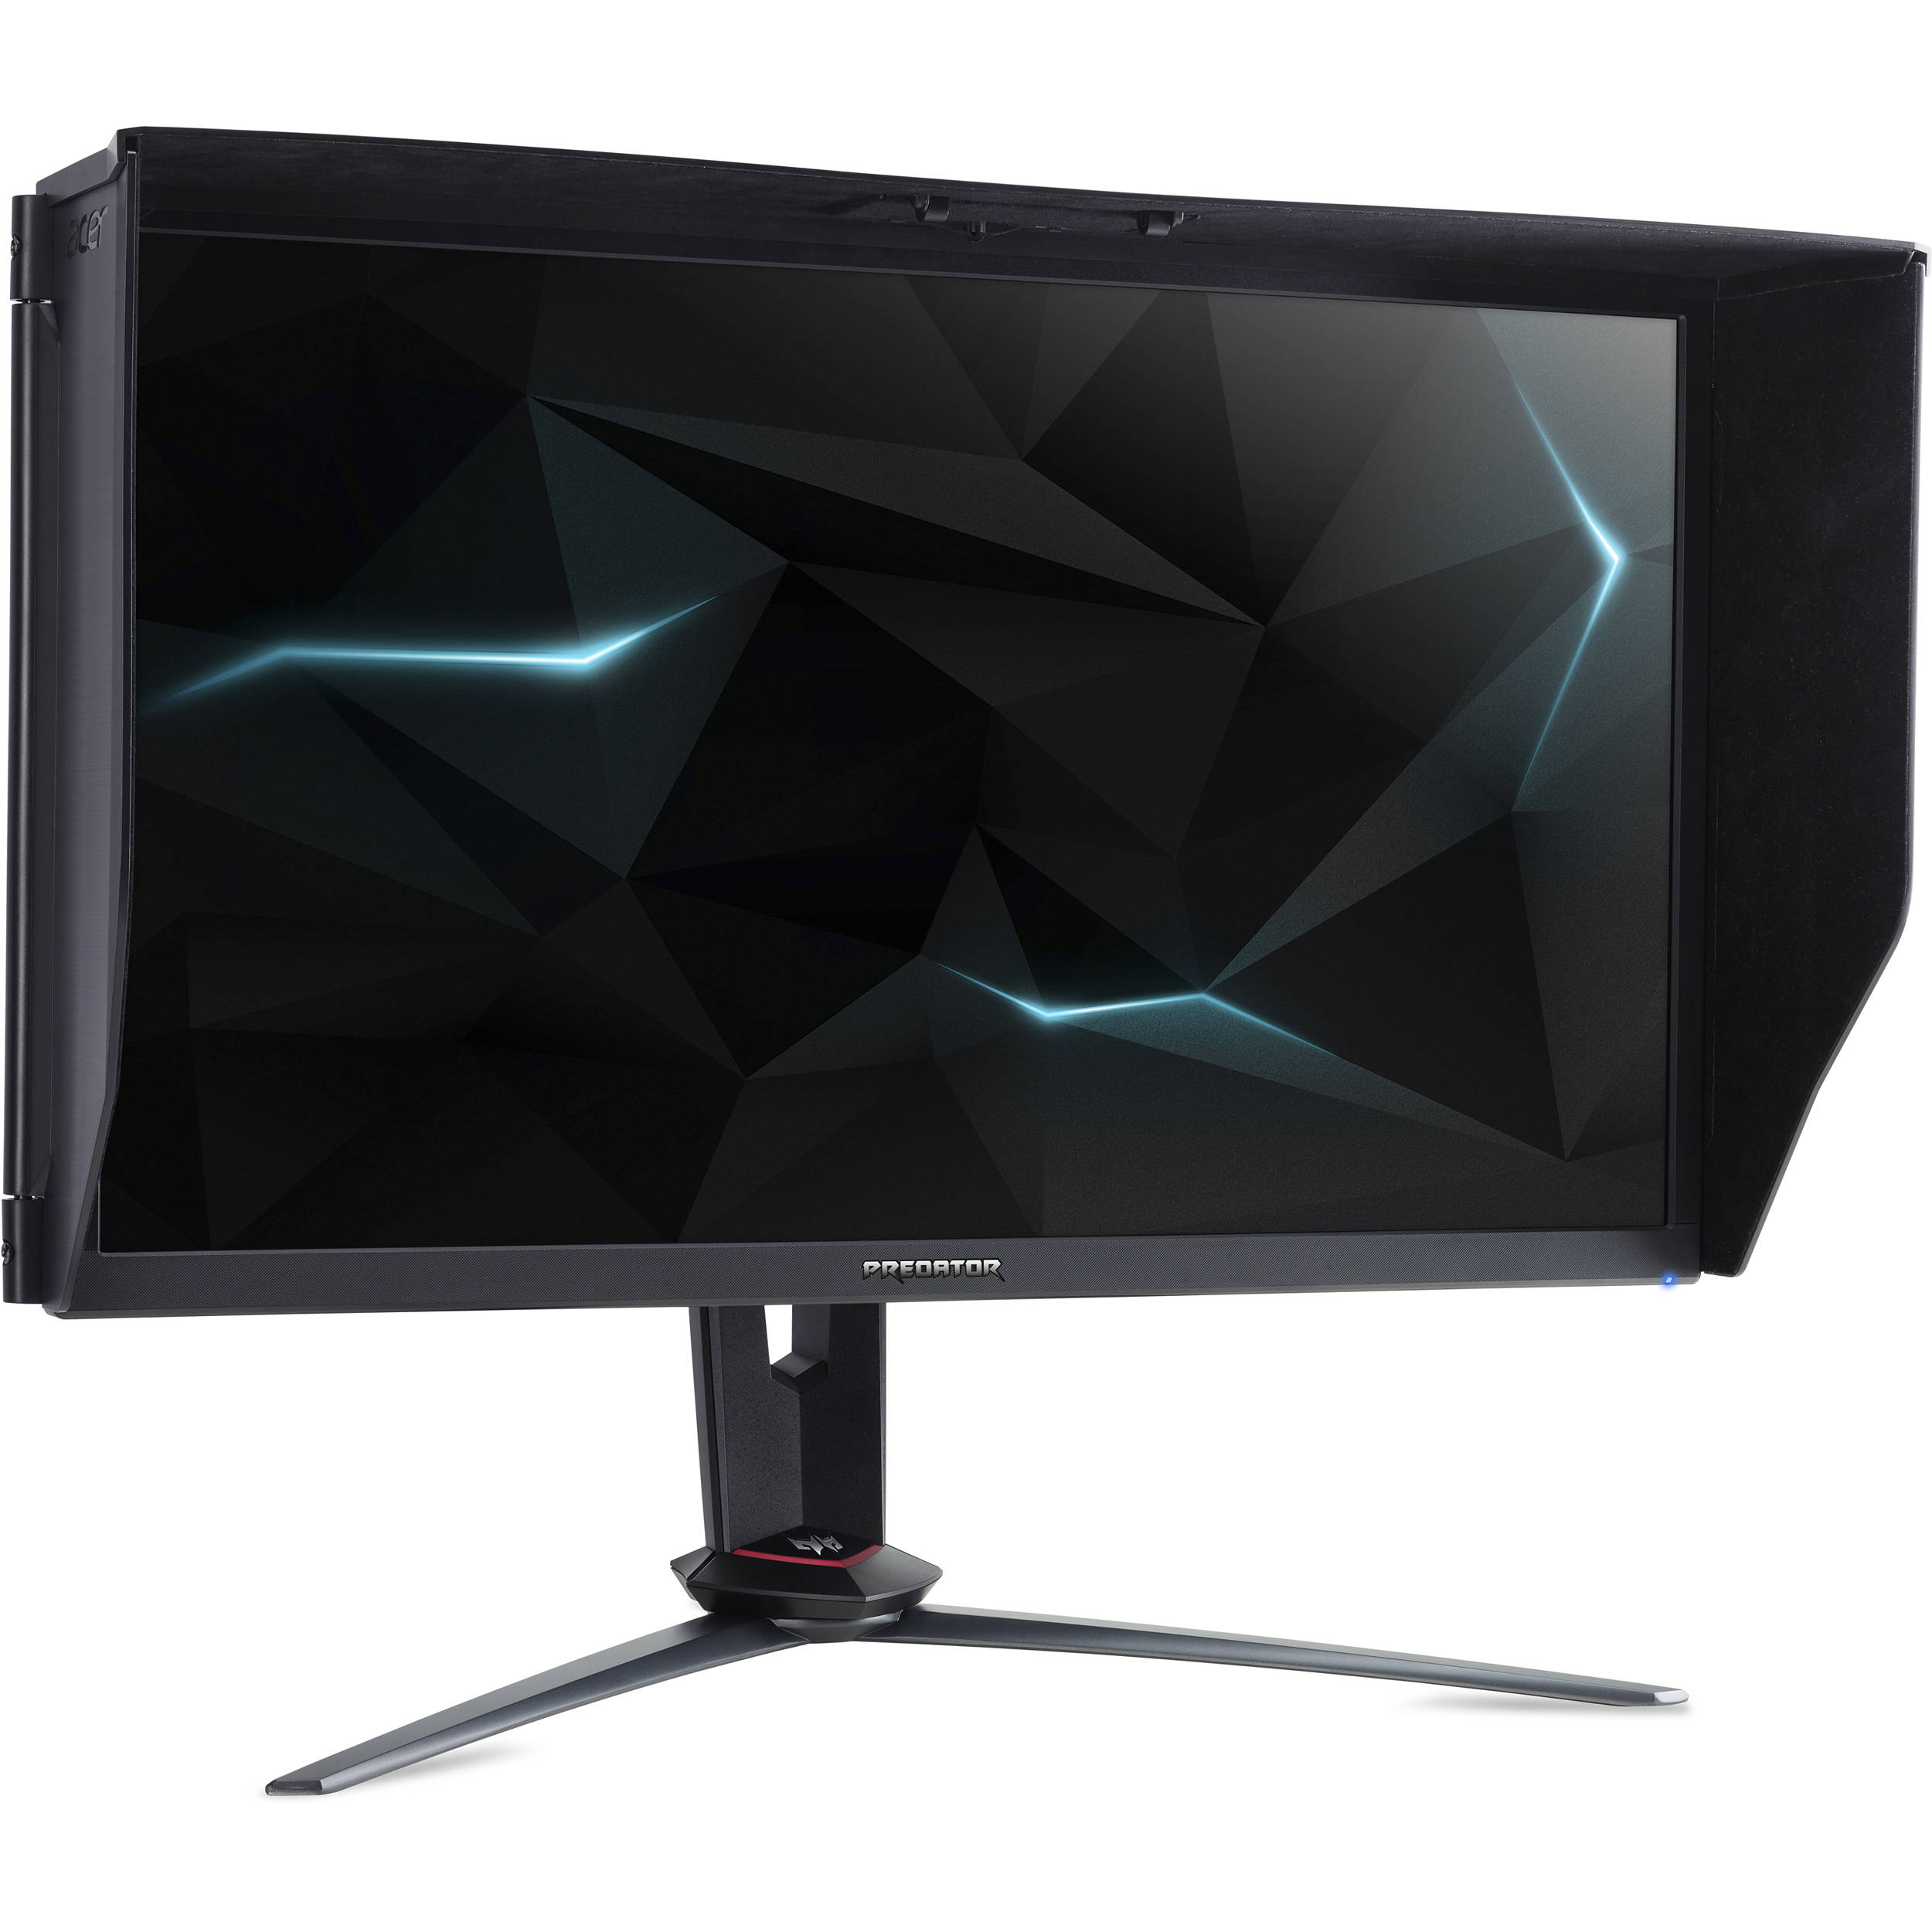 "Acer Predator XB9 9"" 9:9 9K G-SYNC IPS Gaming Monitor"